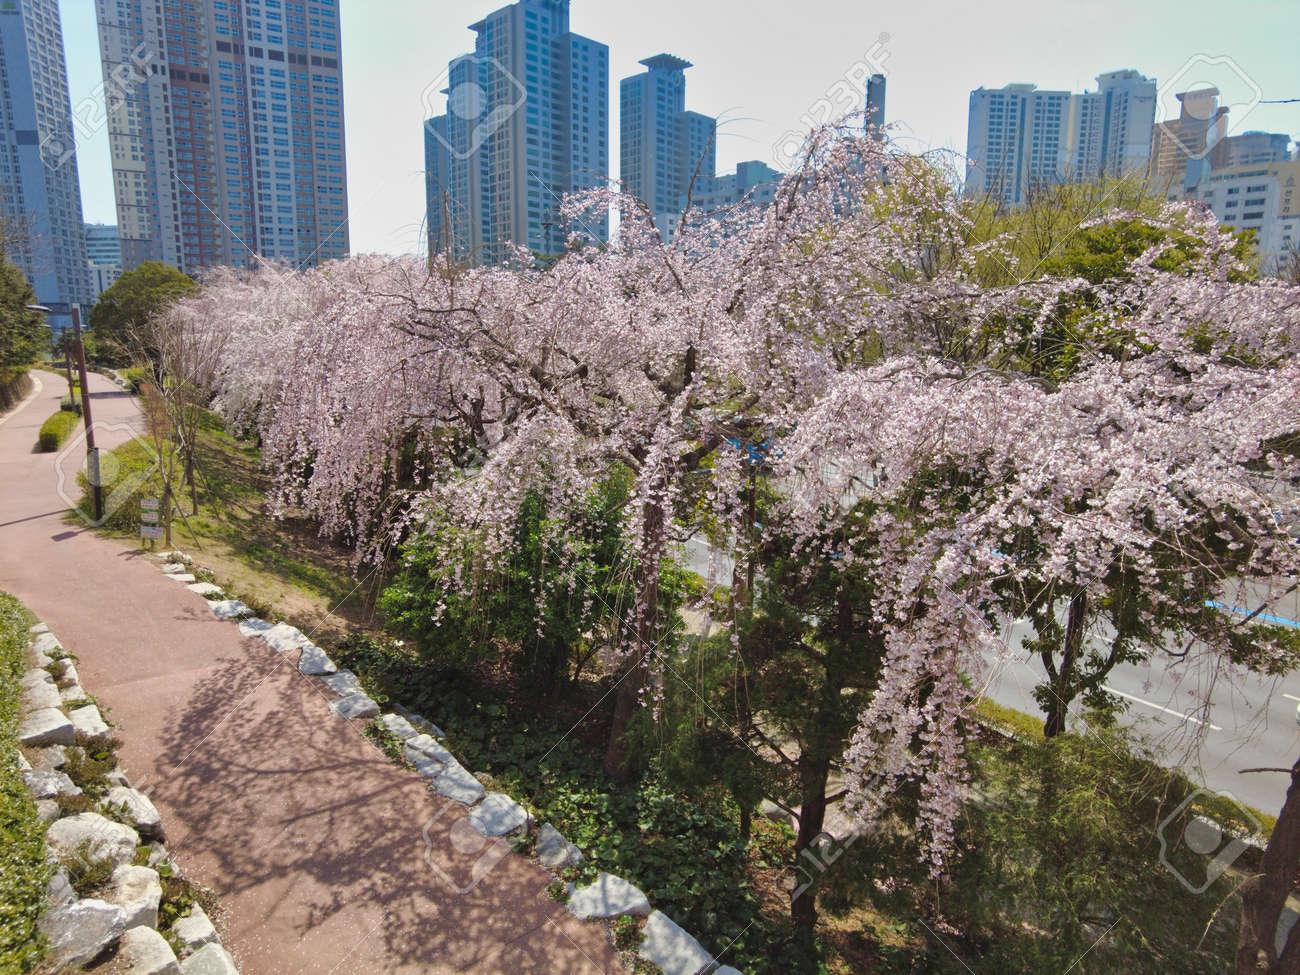 Cheery blossom blooming in haeundae, Busan, South Korea, Asia - 167143045